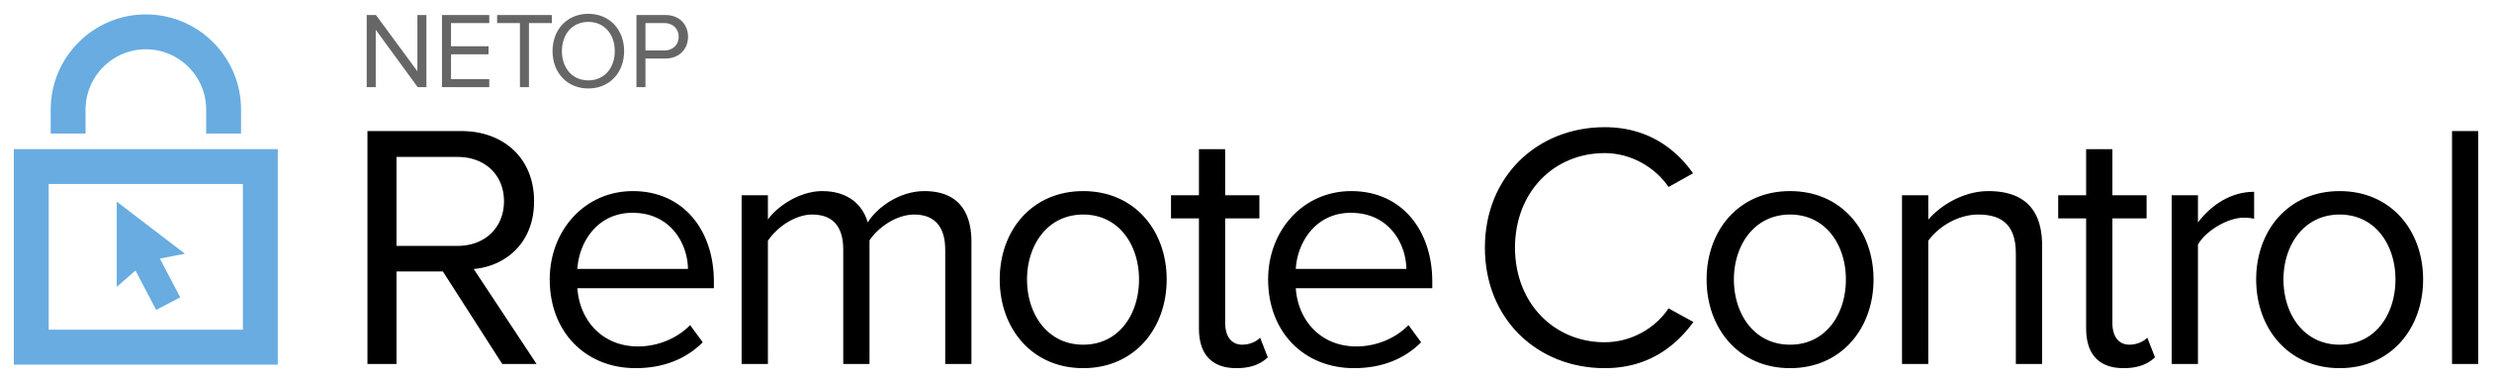 Netop-Remote-Control-Logo_Print-Medium-RGB.jpg